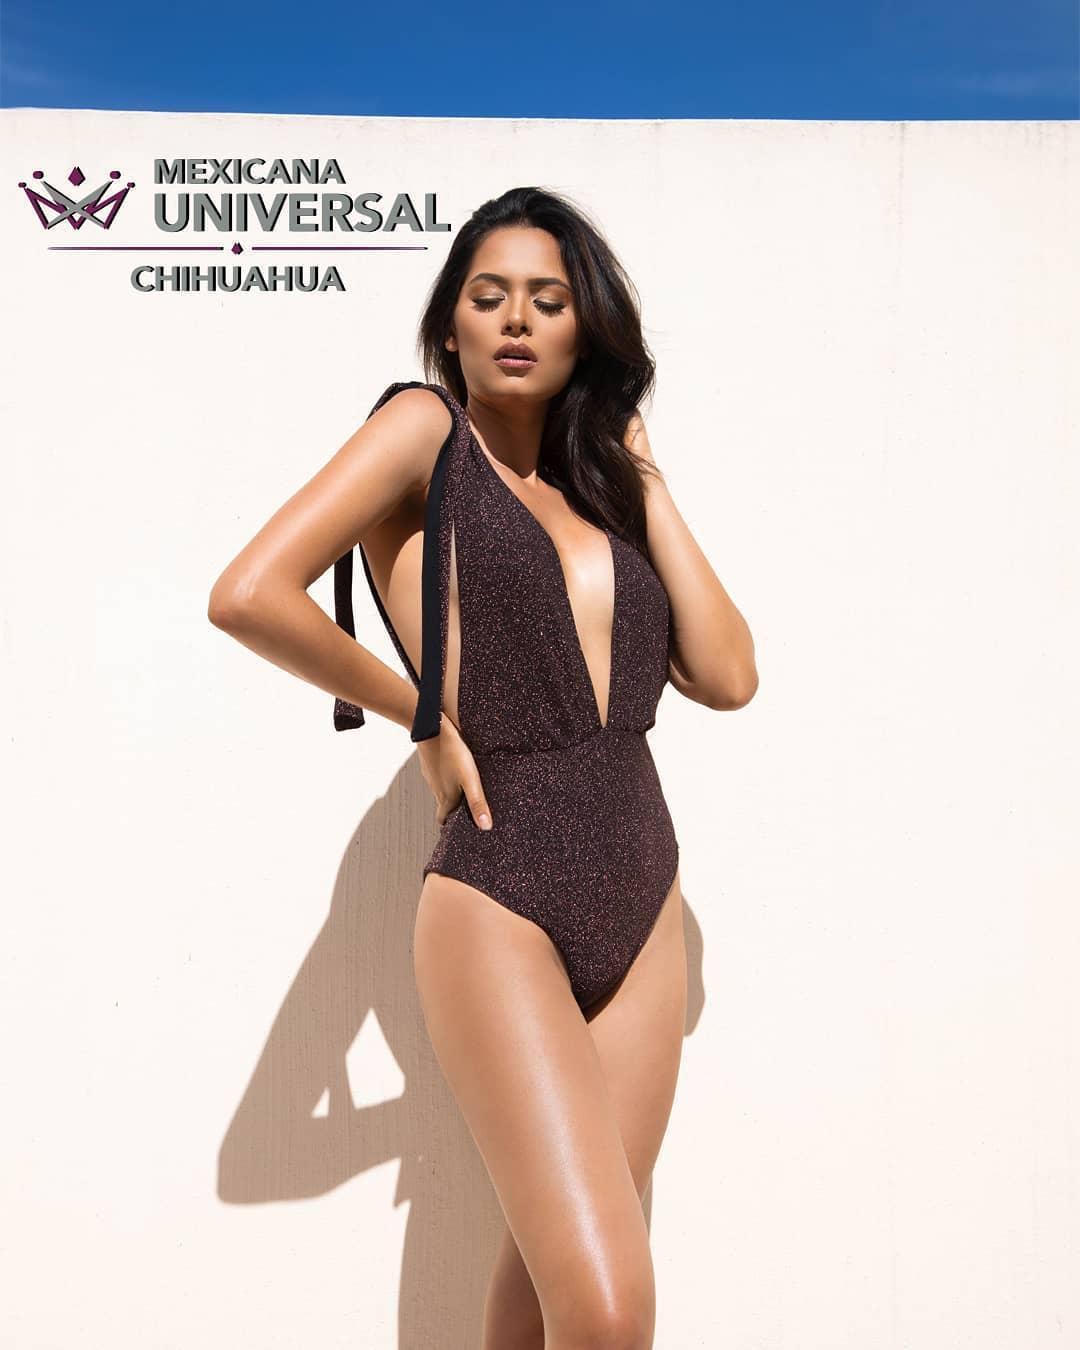 andrea meza, mexicana universal 2020/1st runner-up de miss world 2017. - Página 42 10145110